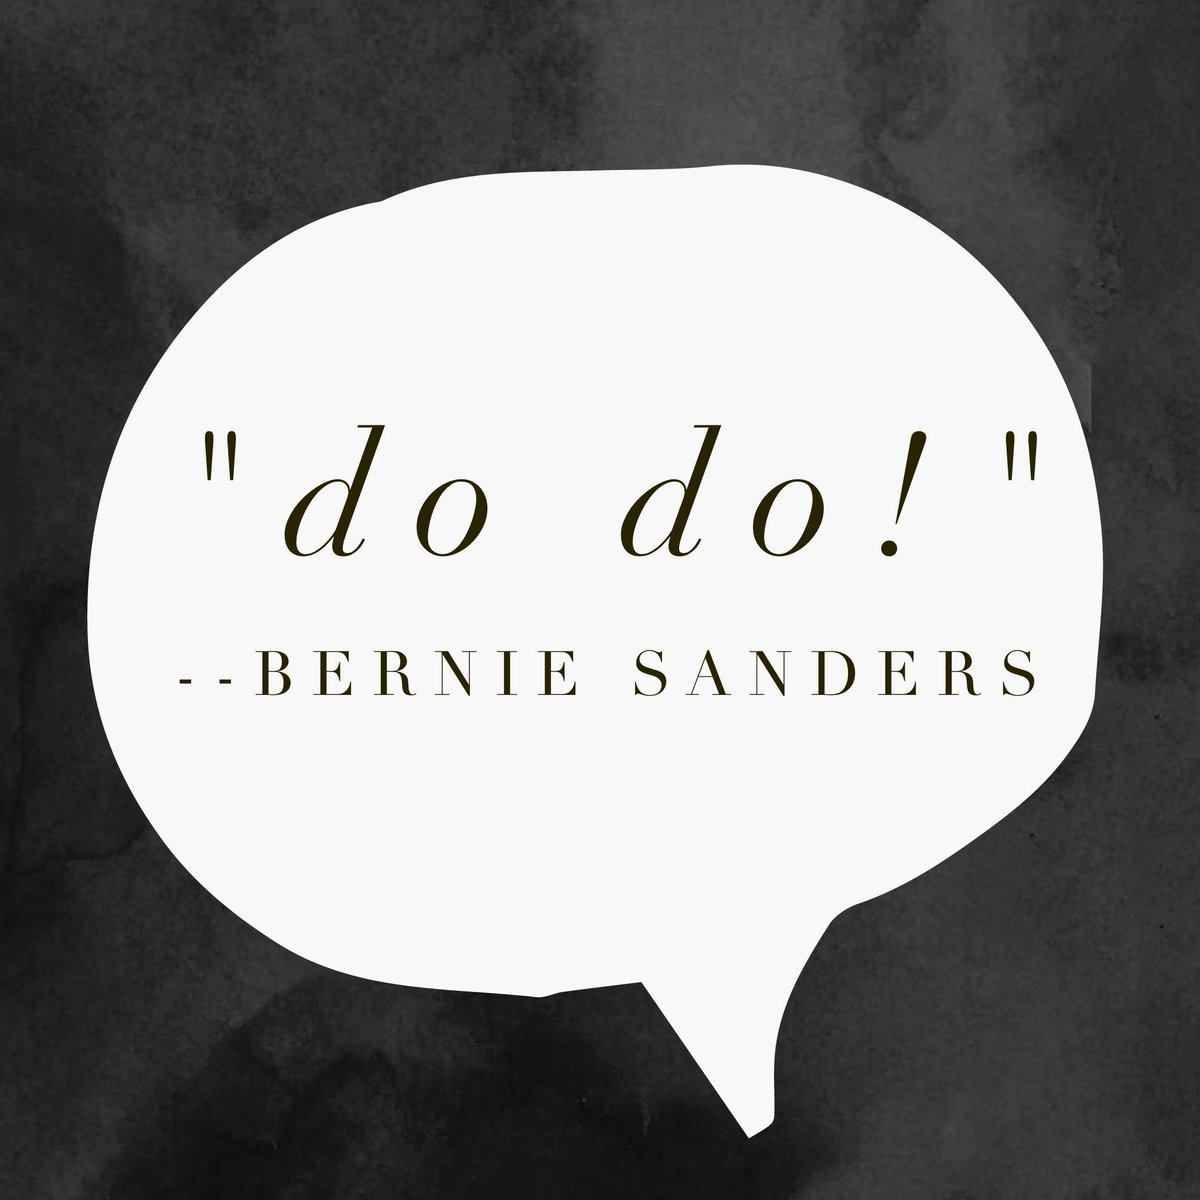 "Tee hee, @BernieSanders said ""do do"" ;) #DemDebate https://t.co/aSbHE7nV8L"